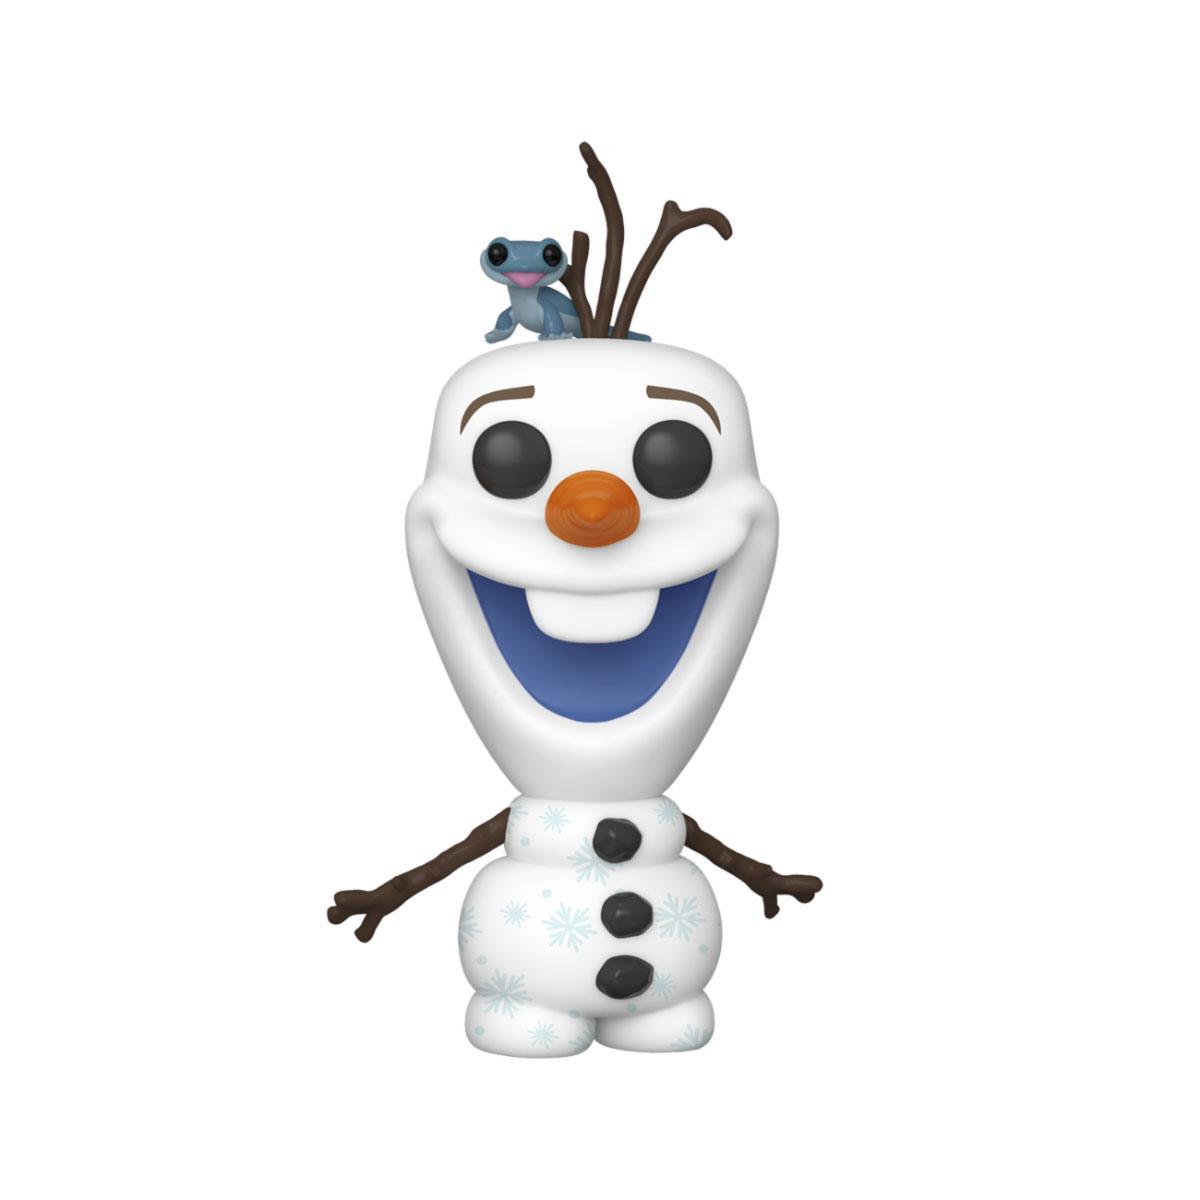 Frozen 2 POP! Disney Vinyl Figure Olaf & Bruni 9 cm